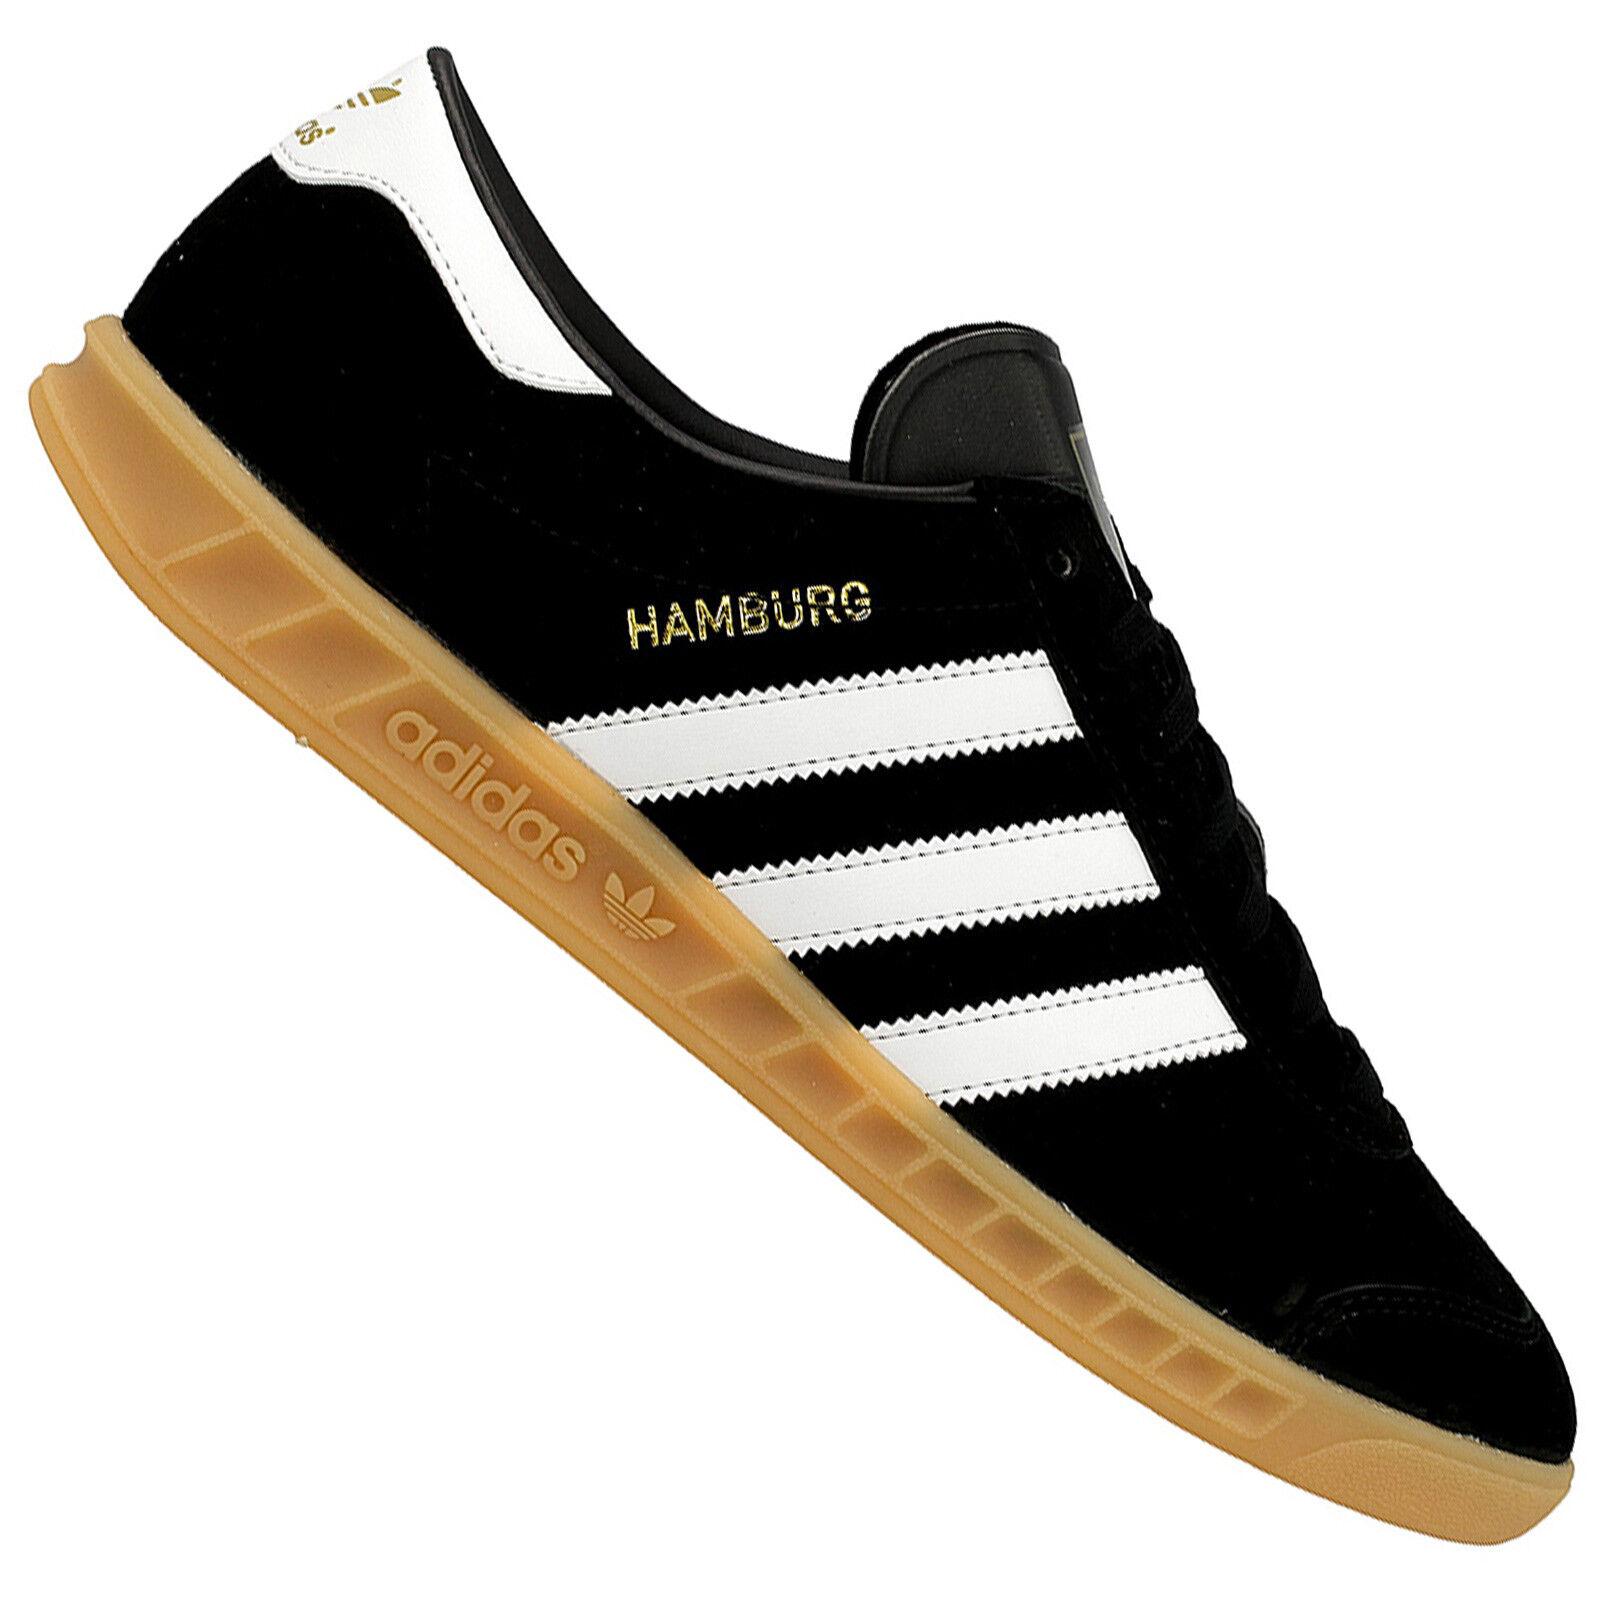 f662ea029554 Adidas Originals Hamburg Men s Women s Sneaker Leather Trainers Black Black  Black White 139de9